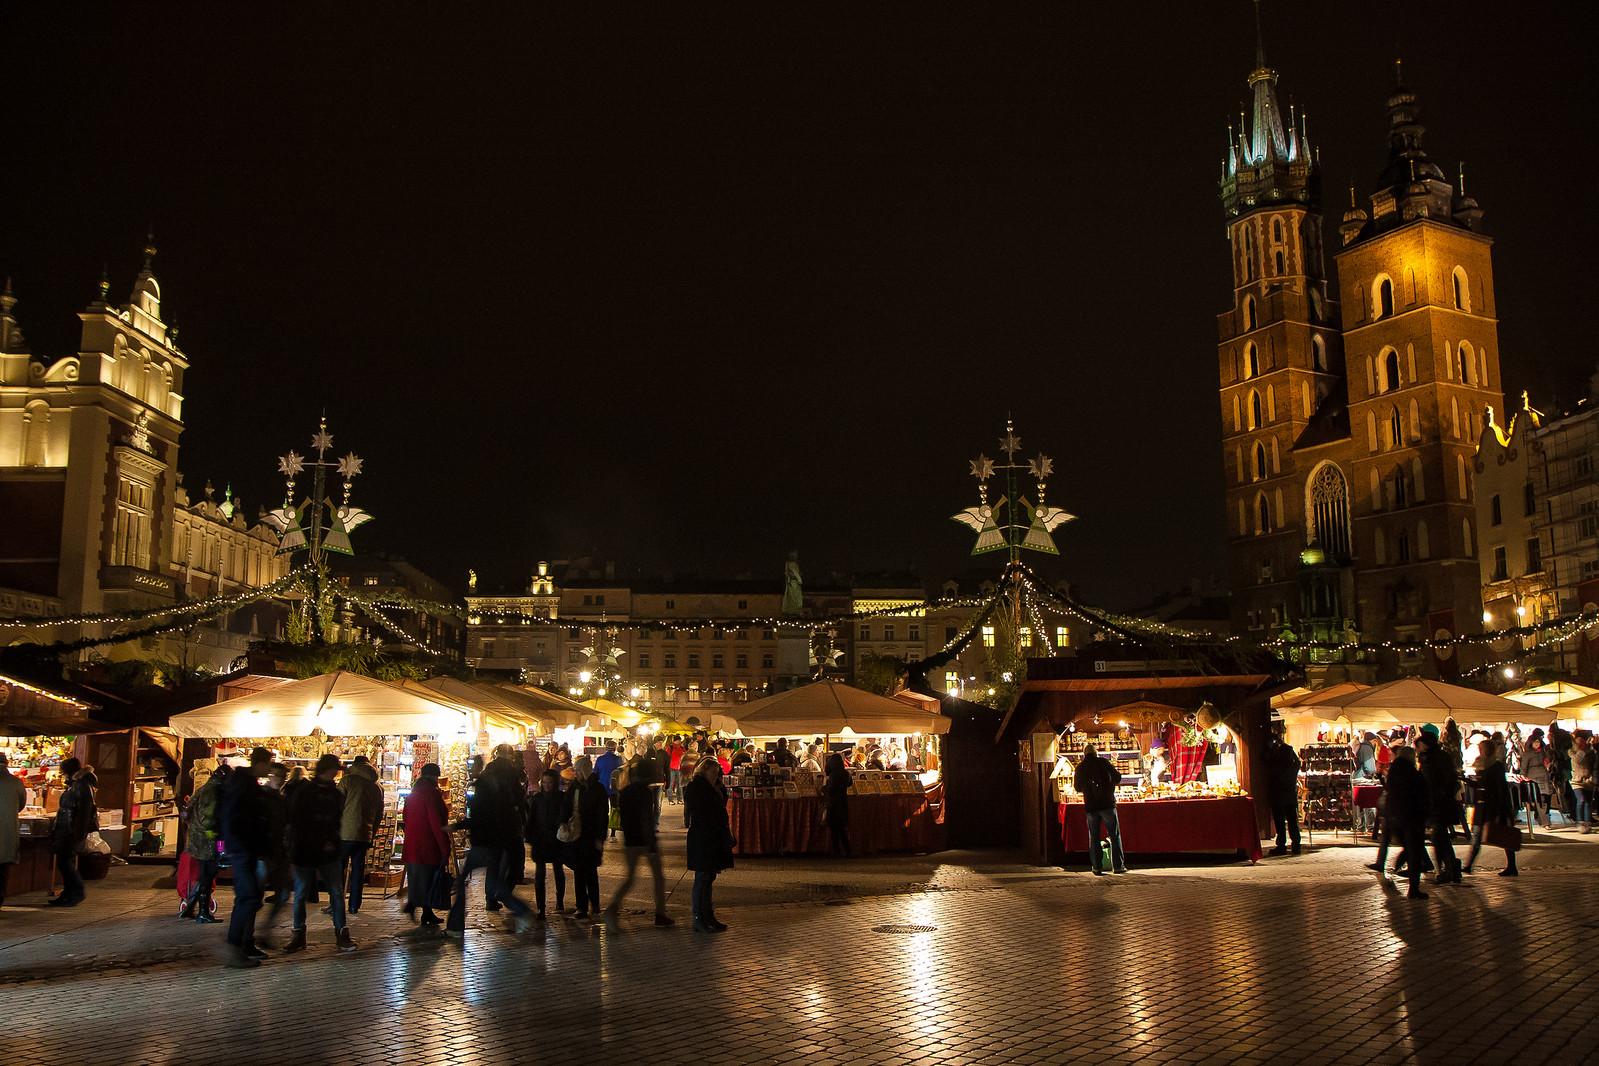 Christmas market in Krakow, Poland. Credit Garrett Ziegler